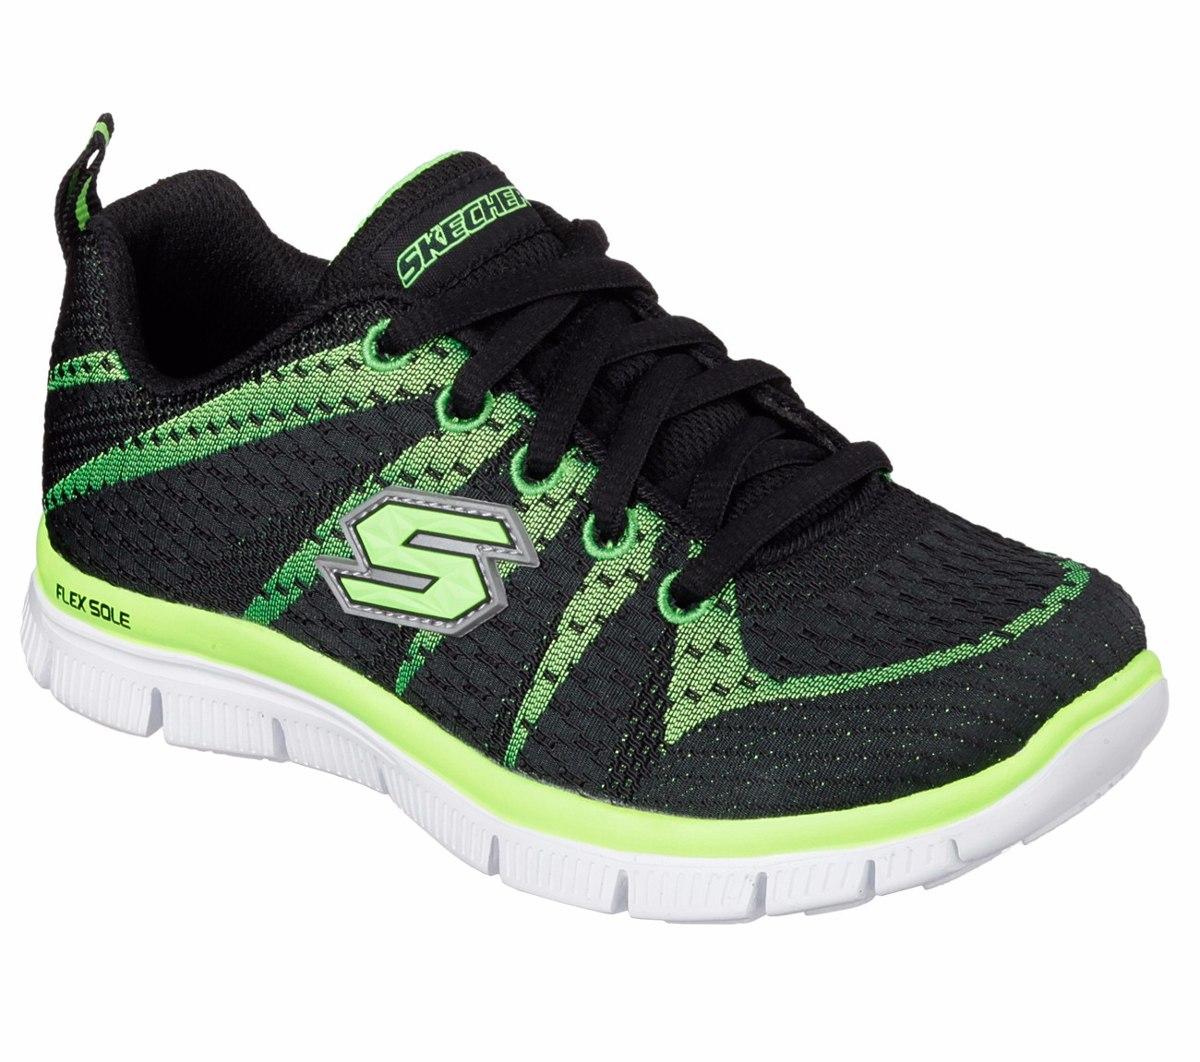 Bs 69 Niño Zapatos Para 0 Gel 95525l En Ollm Skechers Infused r0za0O